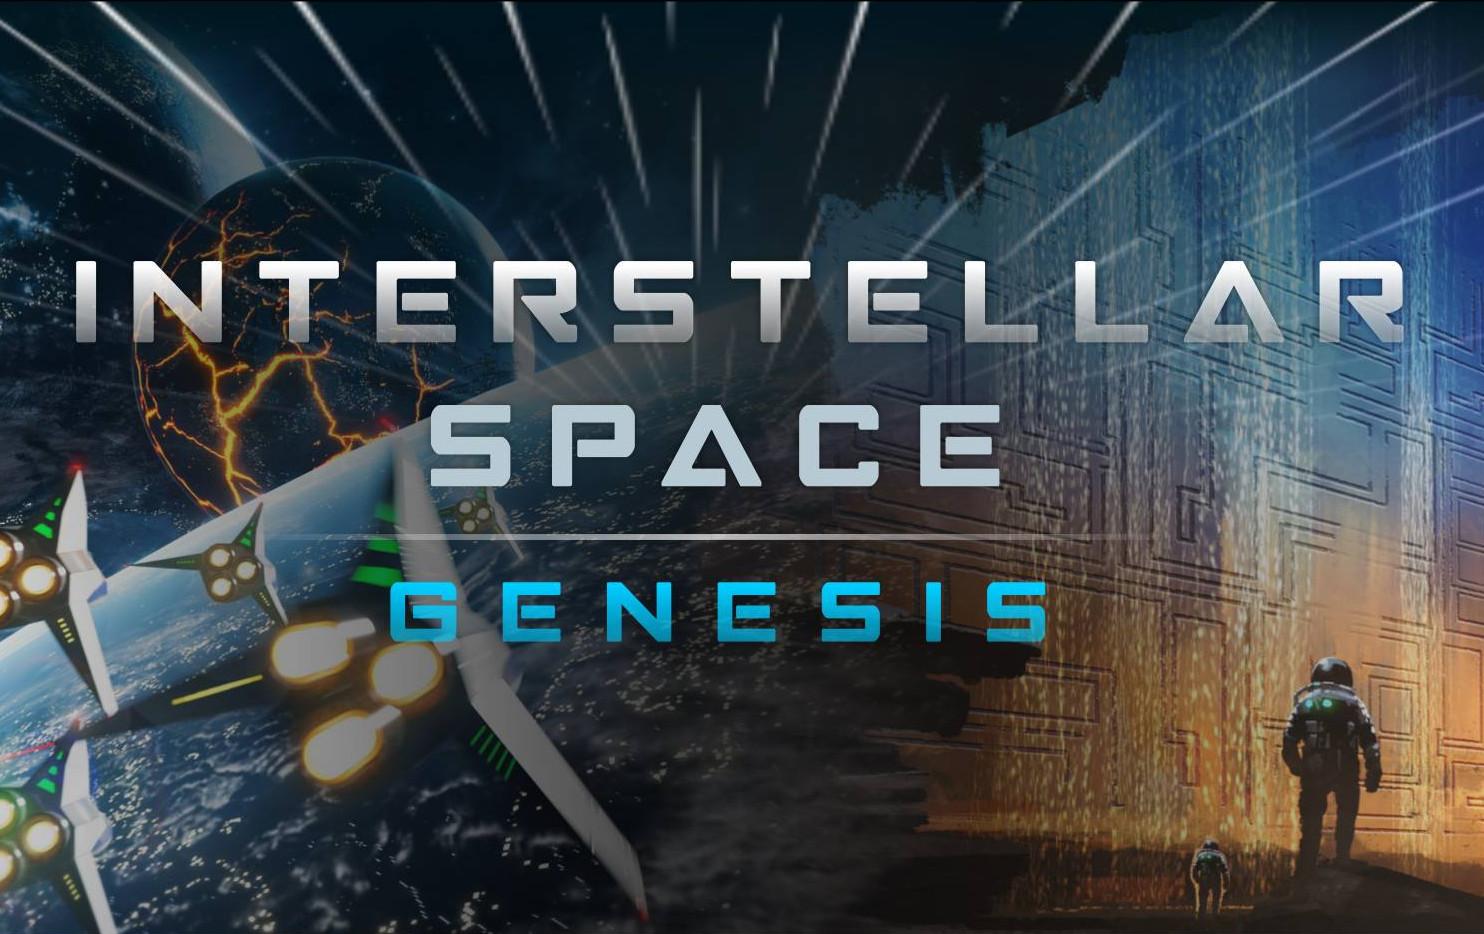 Interstellar Space Genesis - Natural Law v1.2.4 Free Download